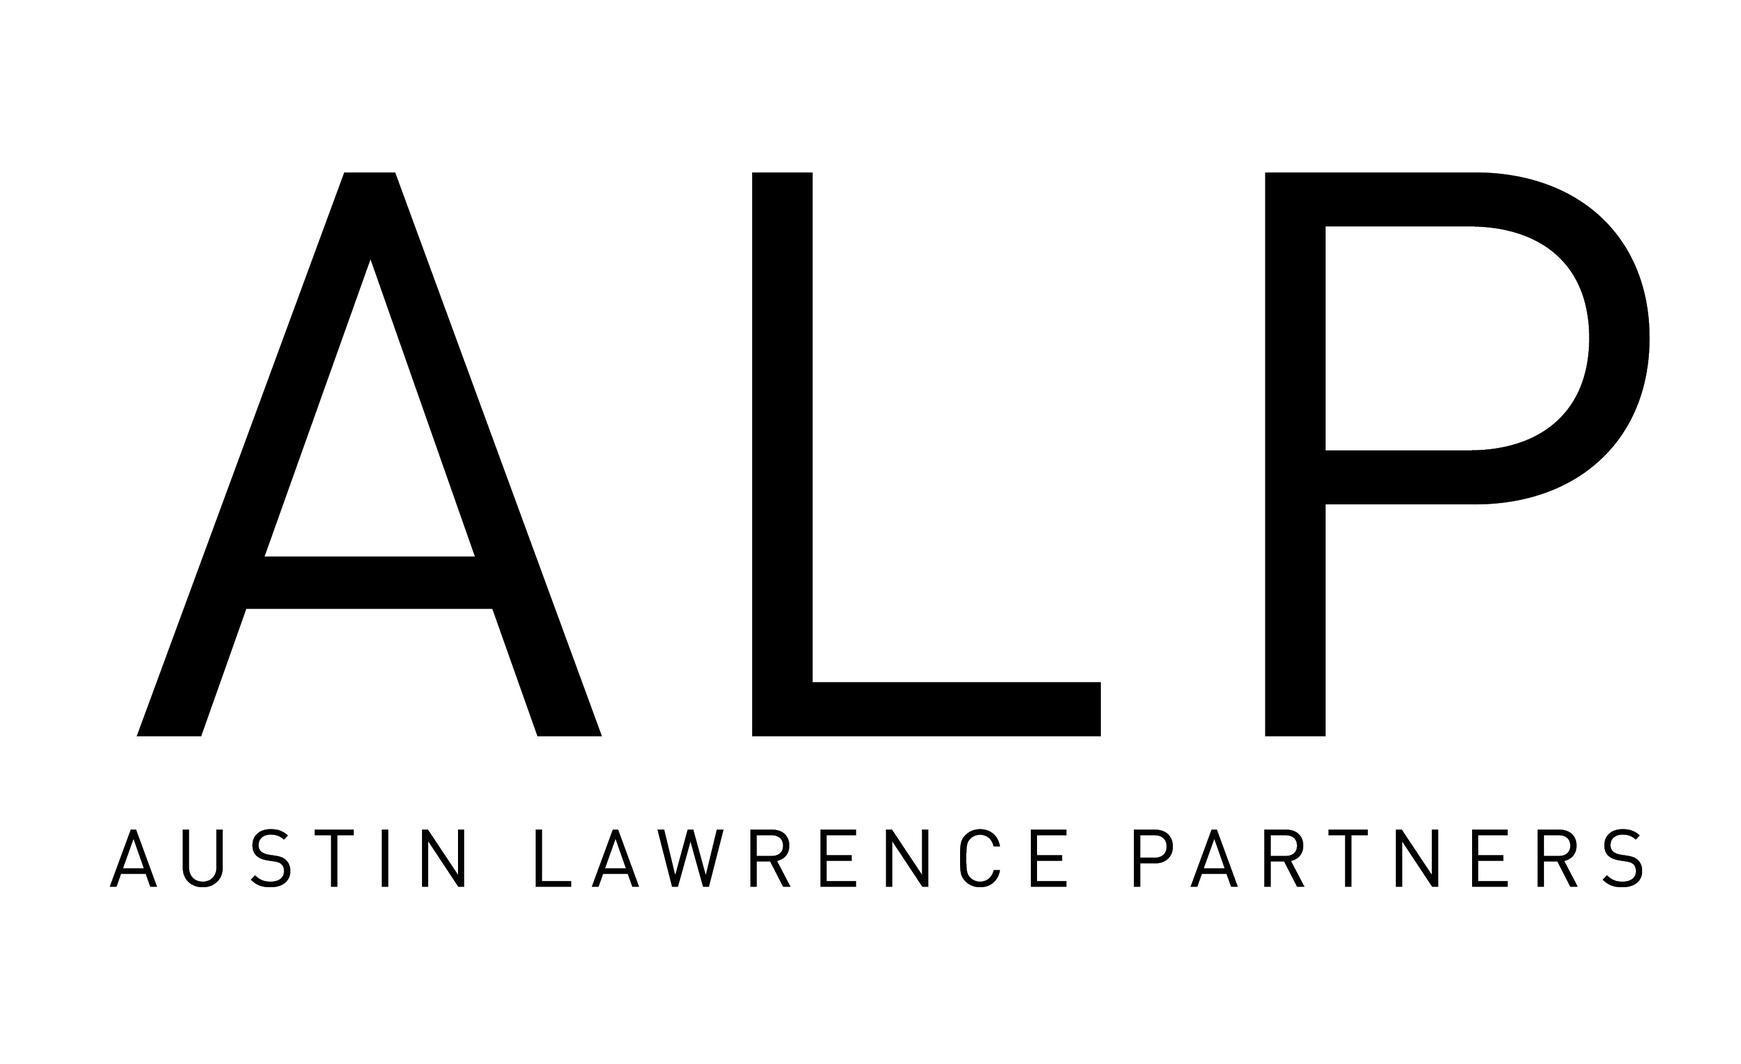 Austin Lawrence Partners